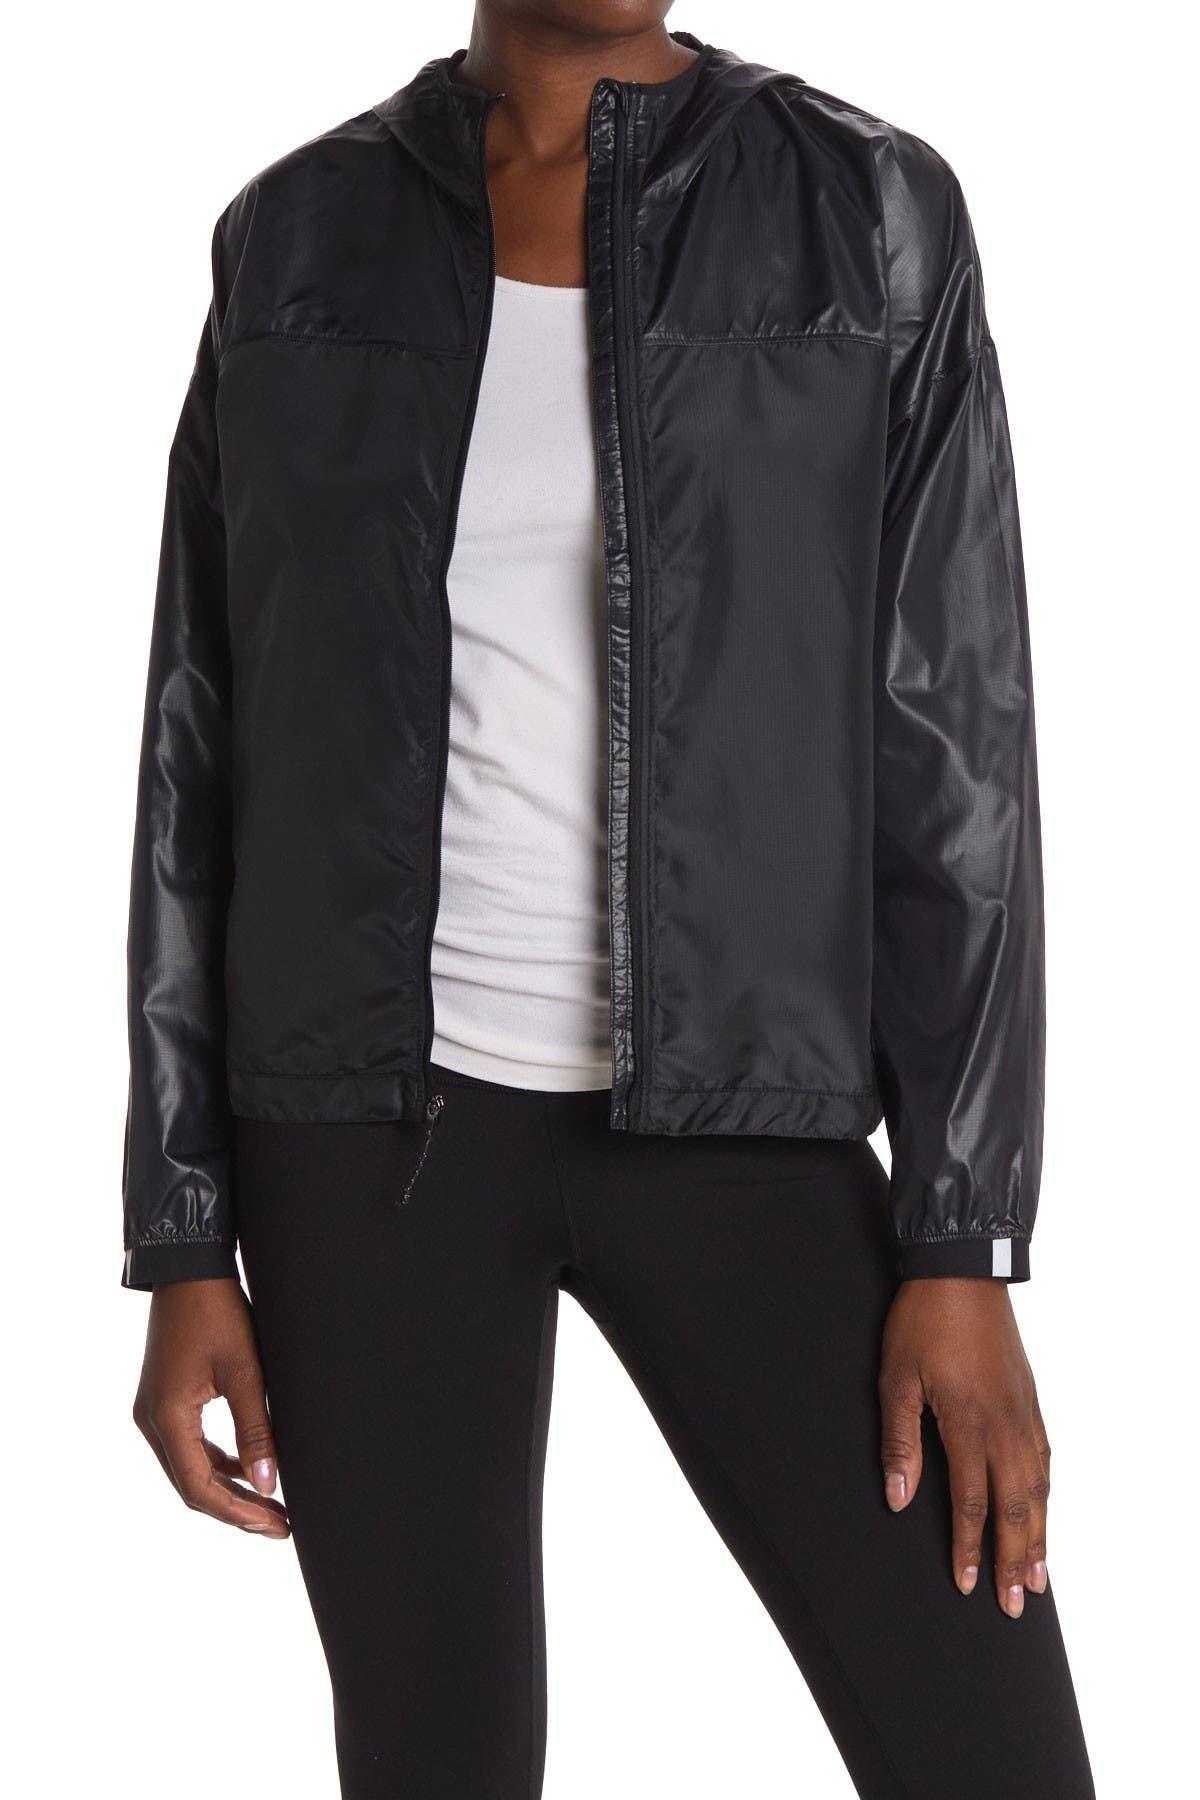 Image of New Balance Light Pack Hooded Jacket